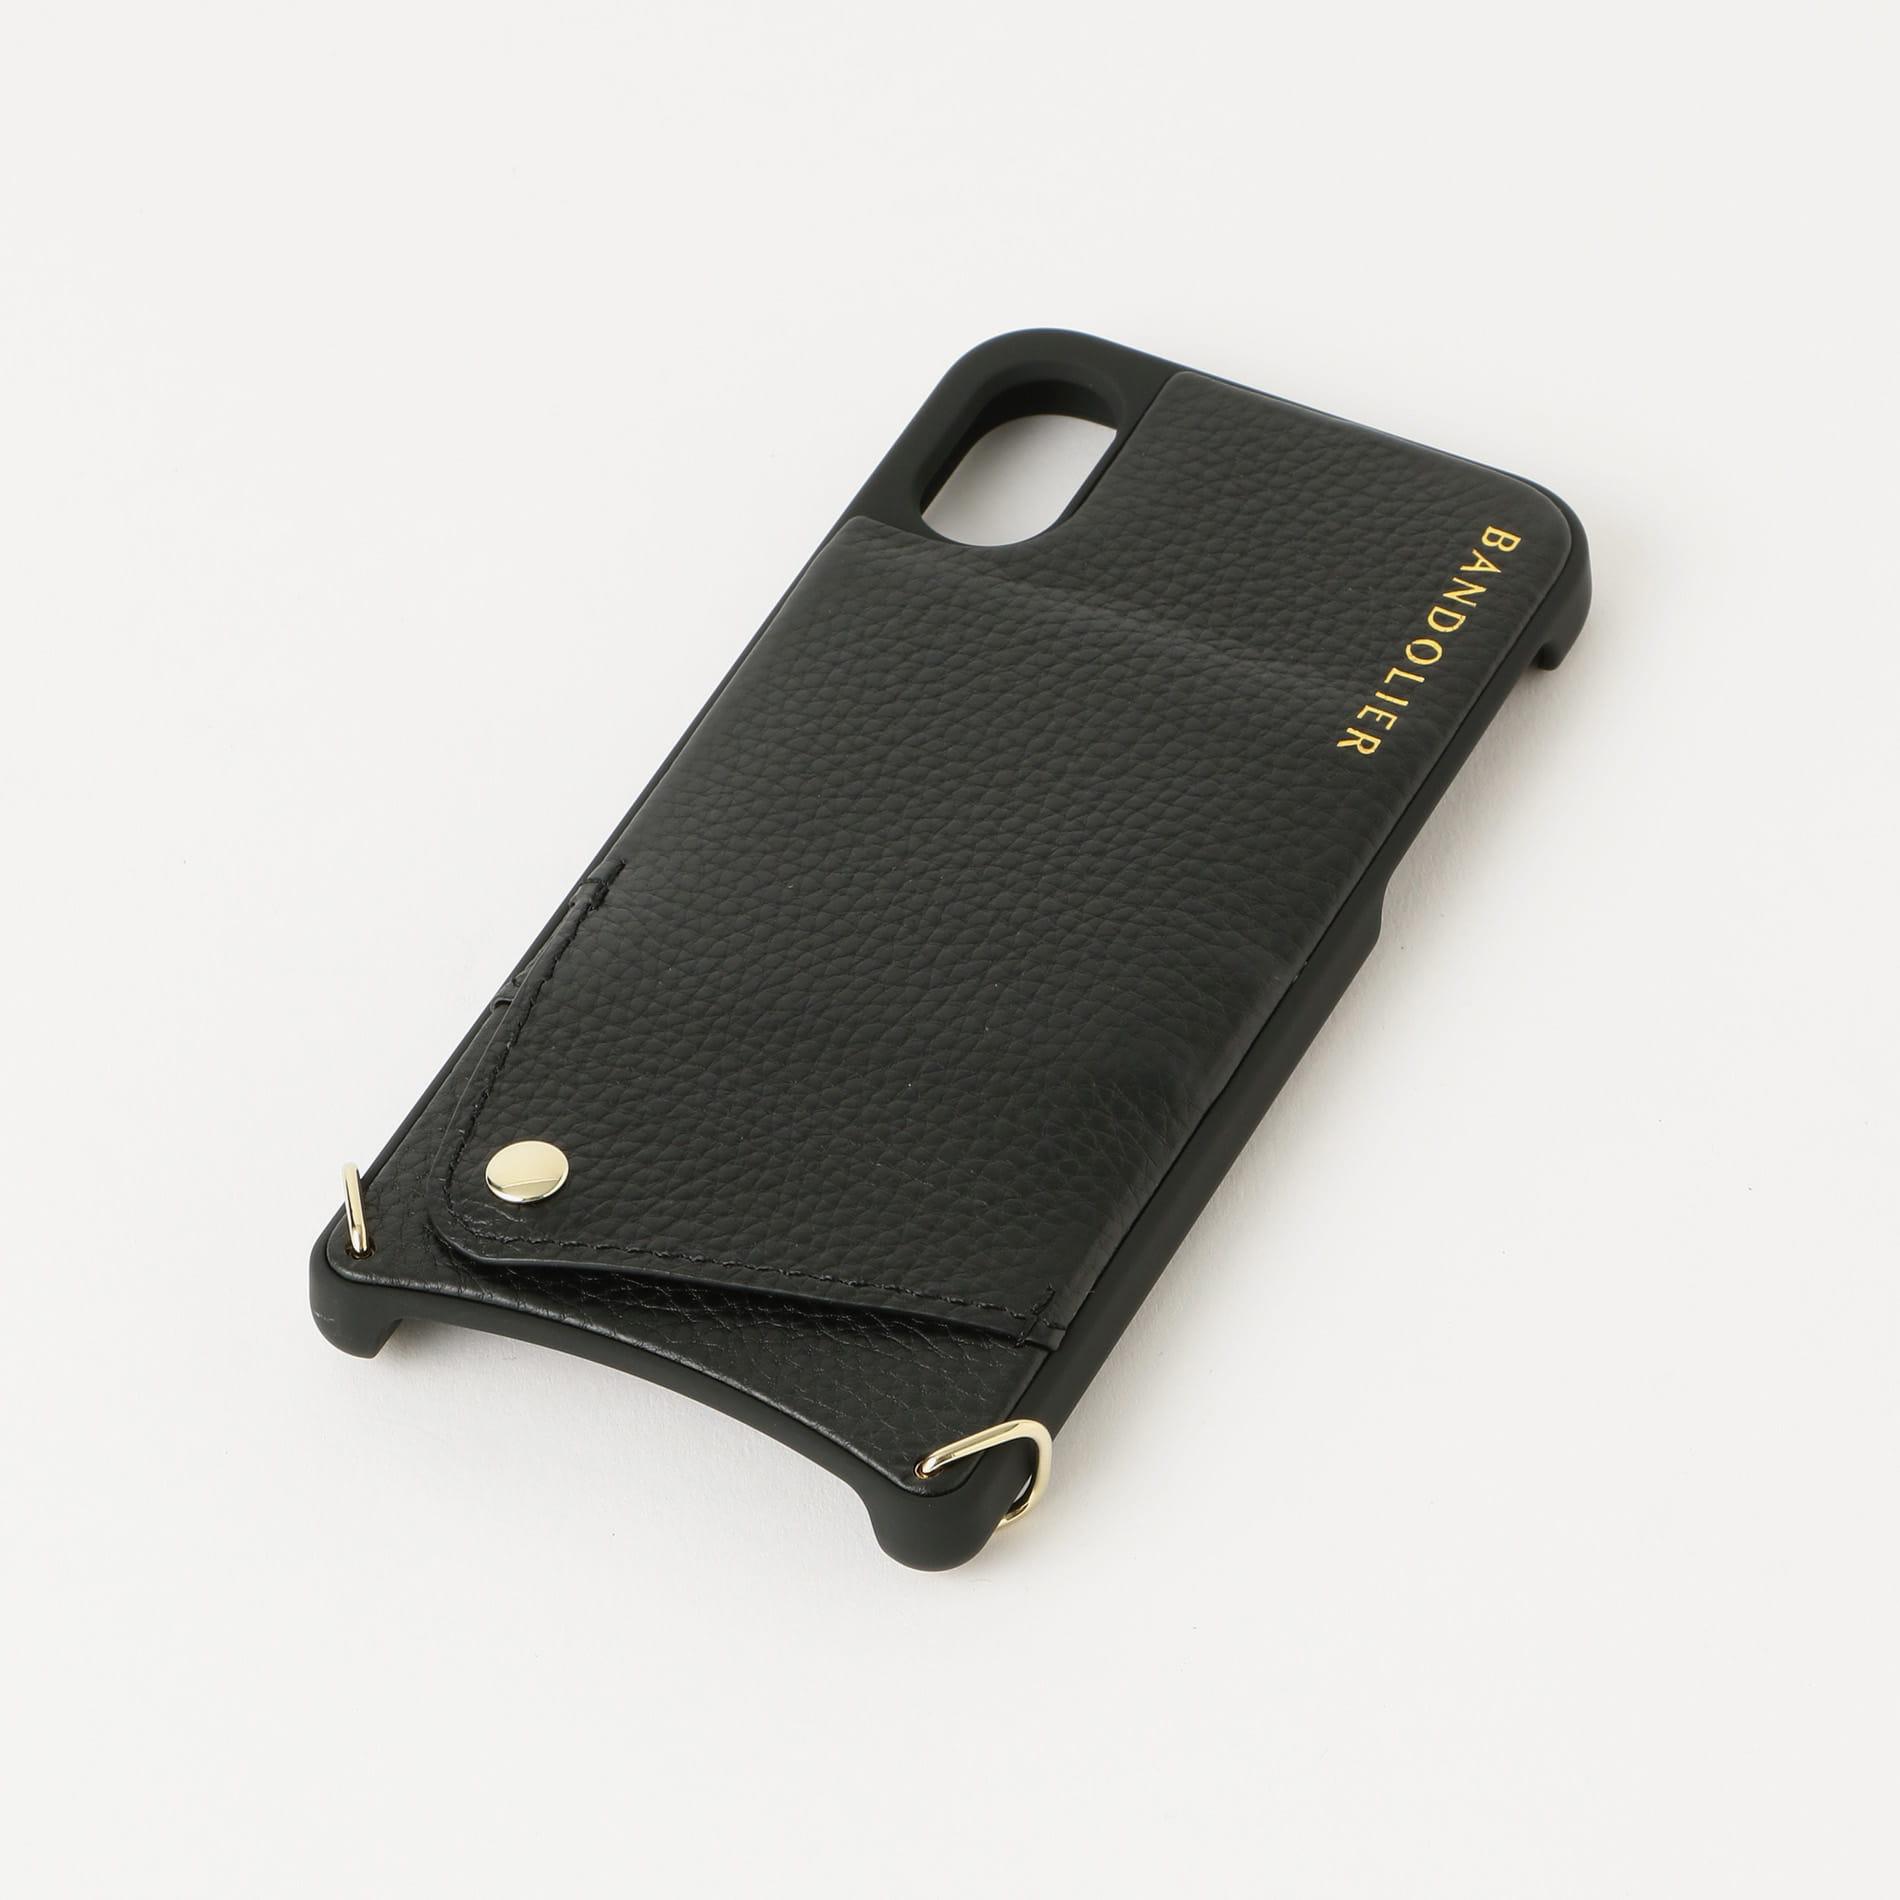 【BANDOLIER】EMMA GOLD iPhone X/XS bdl05-2900-x